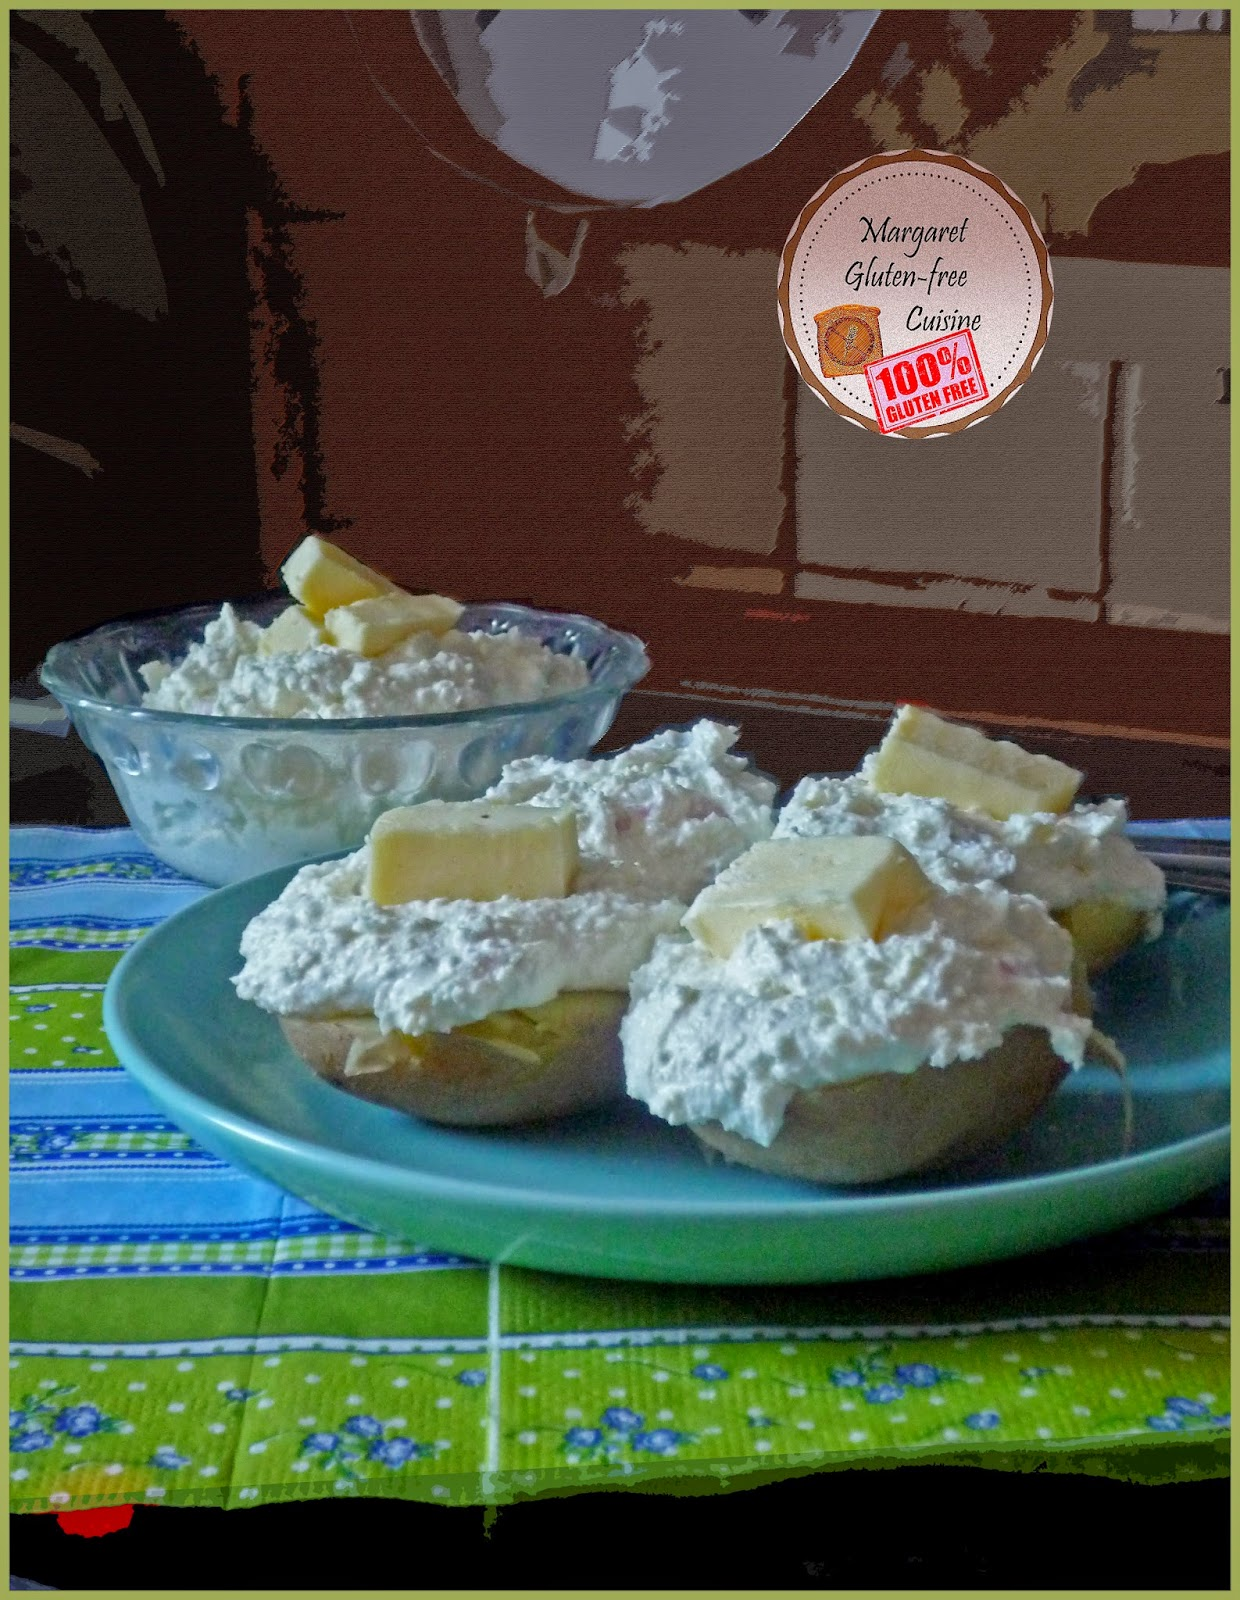 Kuchnia Bezglutenowa Margaret Gzik Z Ziemniakami W Mundurkach